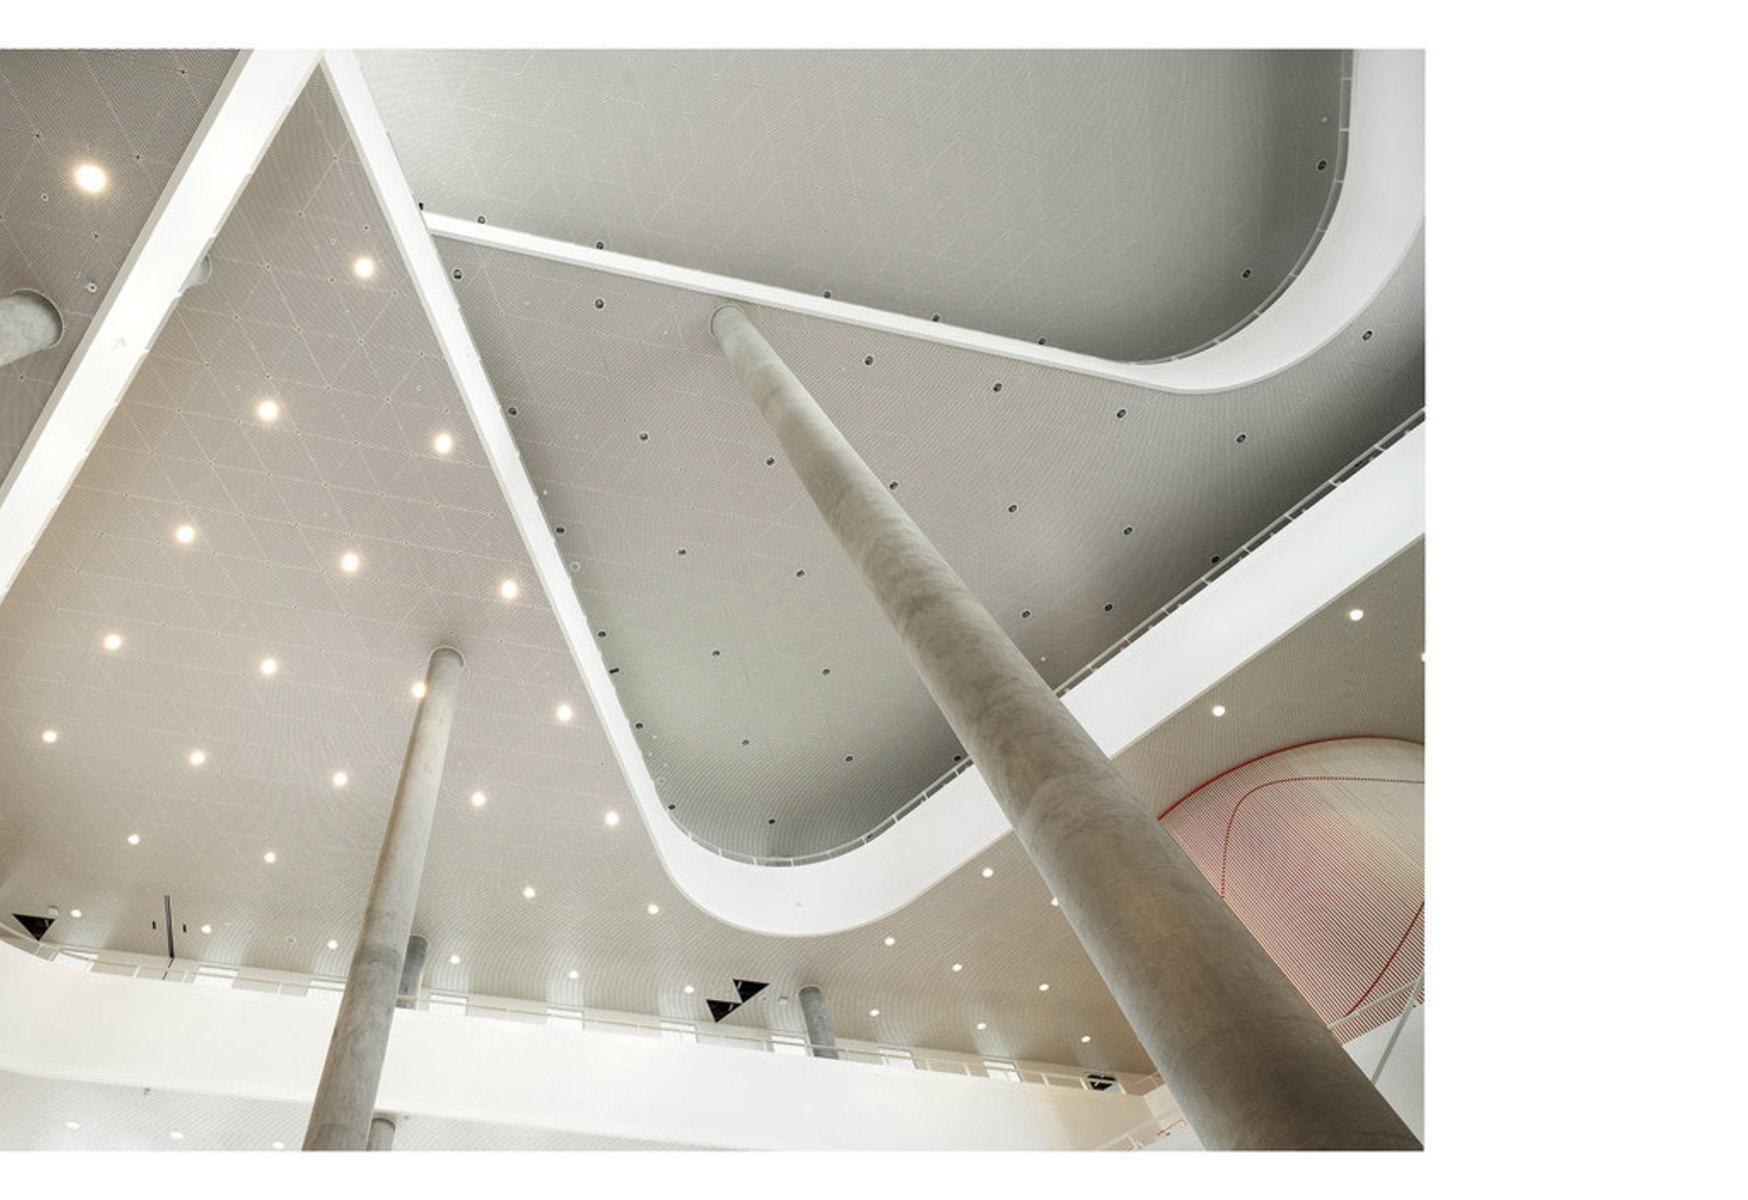 Le cabinet Henning Larsen Architects inaugure le campus de Kolding au Danemark